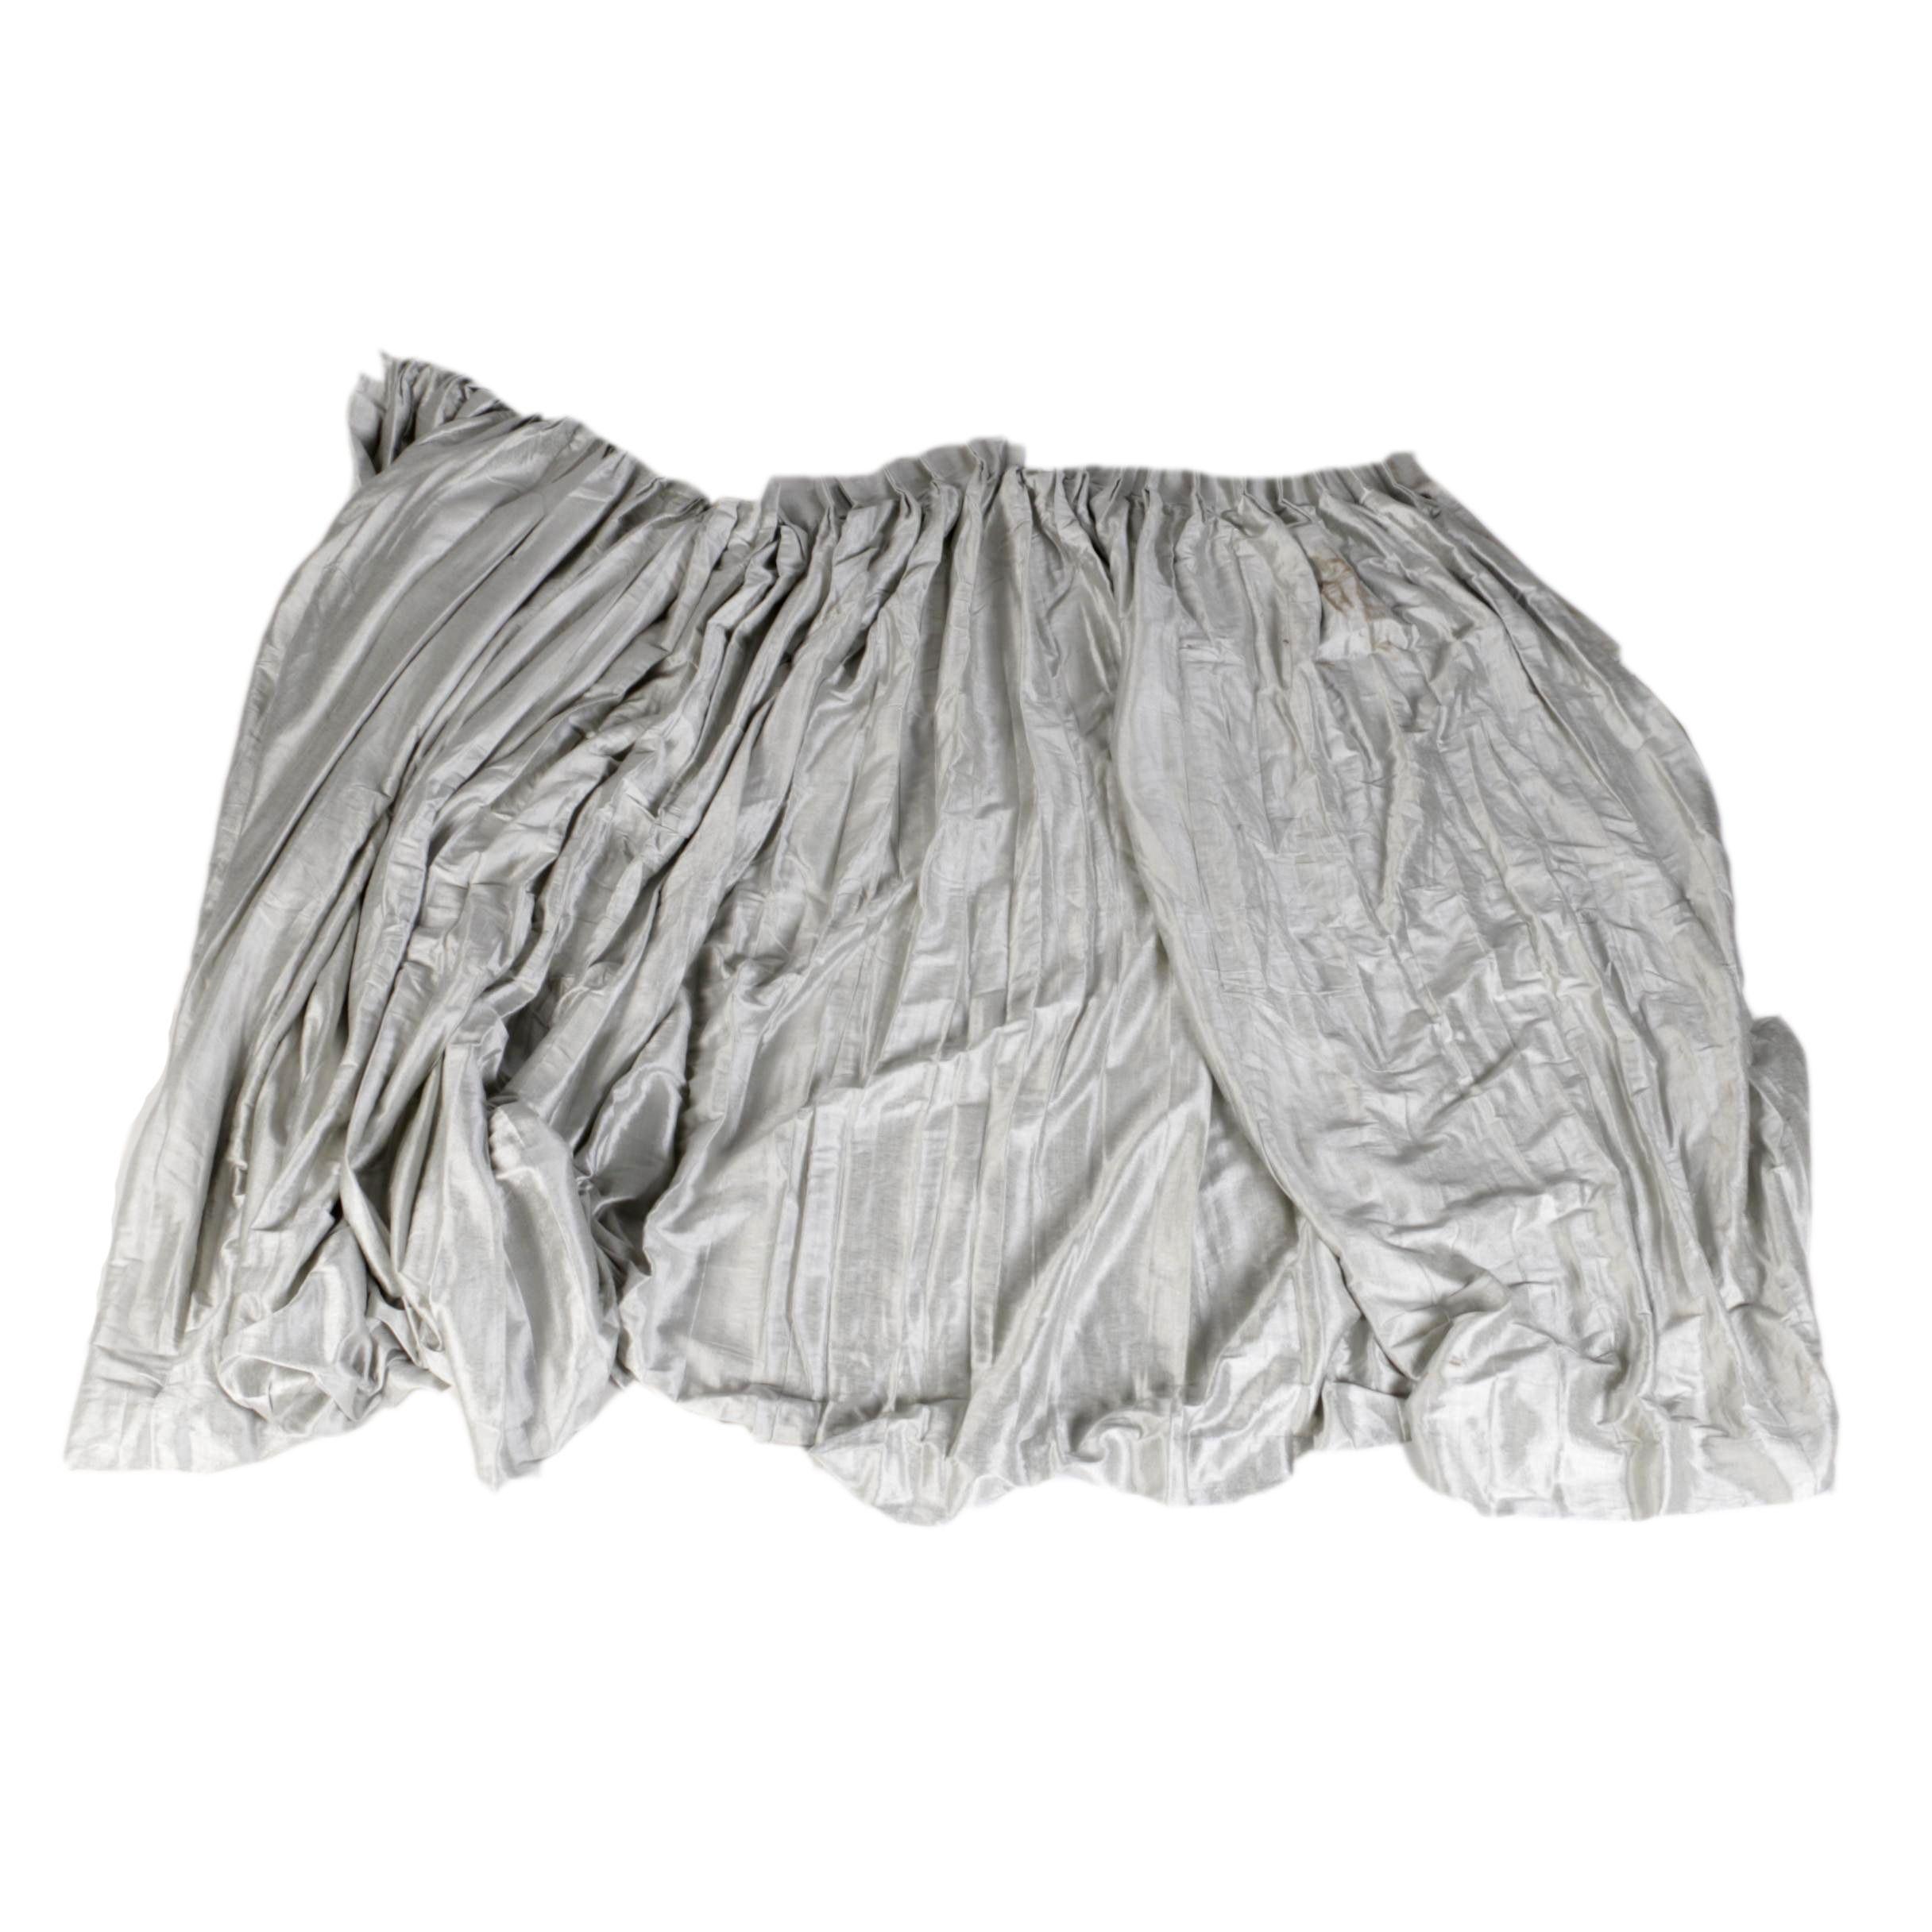 Custom Silver Gray Pinch Pleat Drapery Panel With Rod